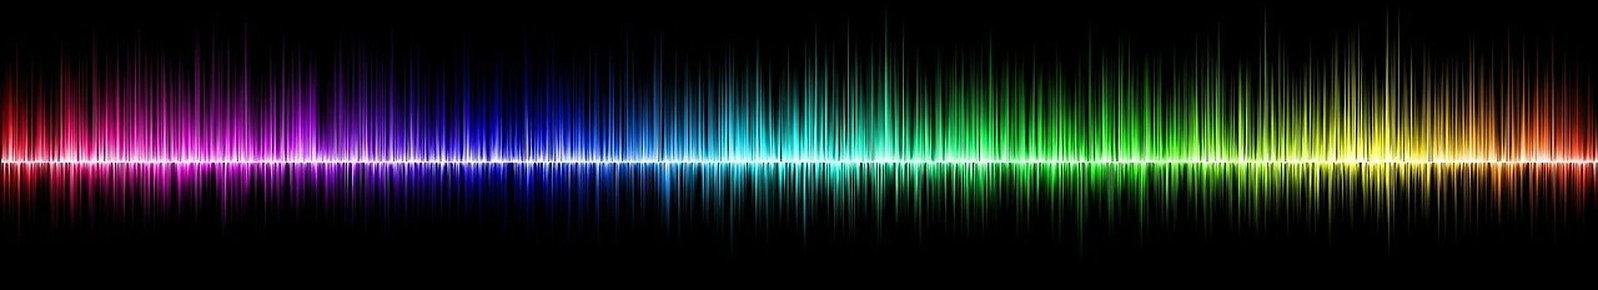 frequency wave bg 2000 px w.jpg